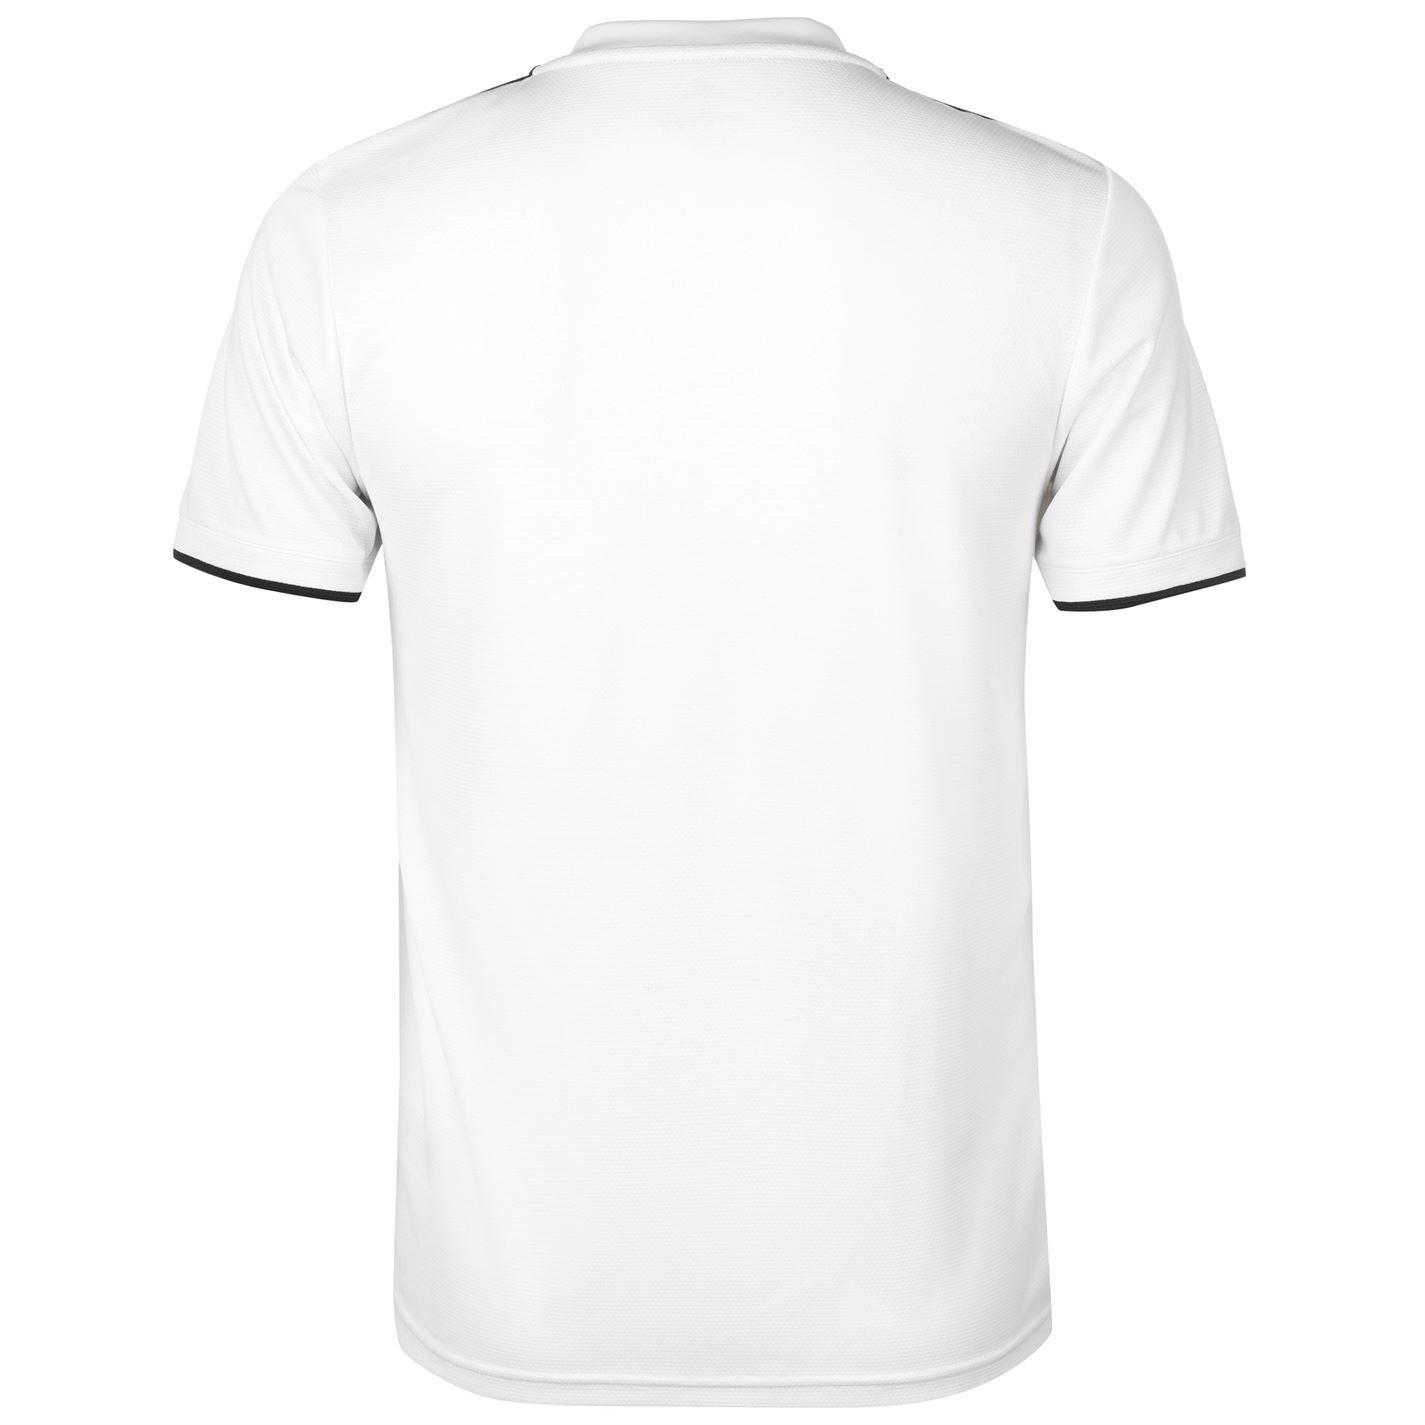 6008b9c01 ... adidas Real Madrid Home Jersey 2018-19 Mens White Football Soccer Shirt  Top